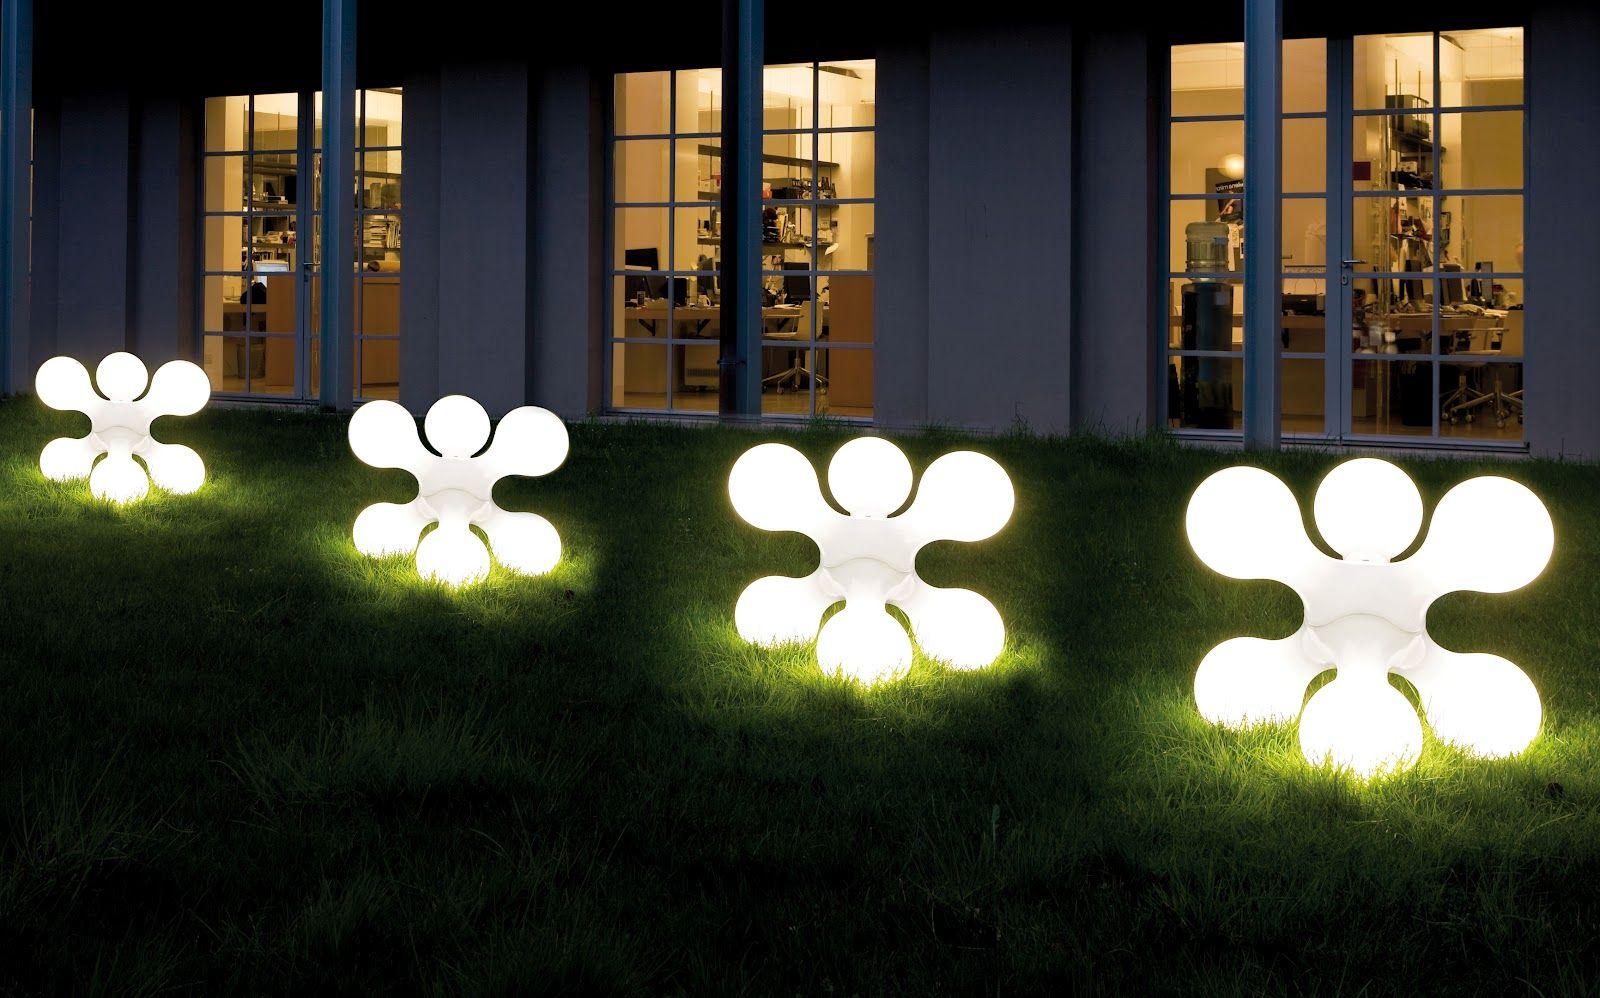 1000+ images about Pihan ja puutarhan valot - Garden lighting on ...